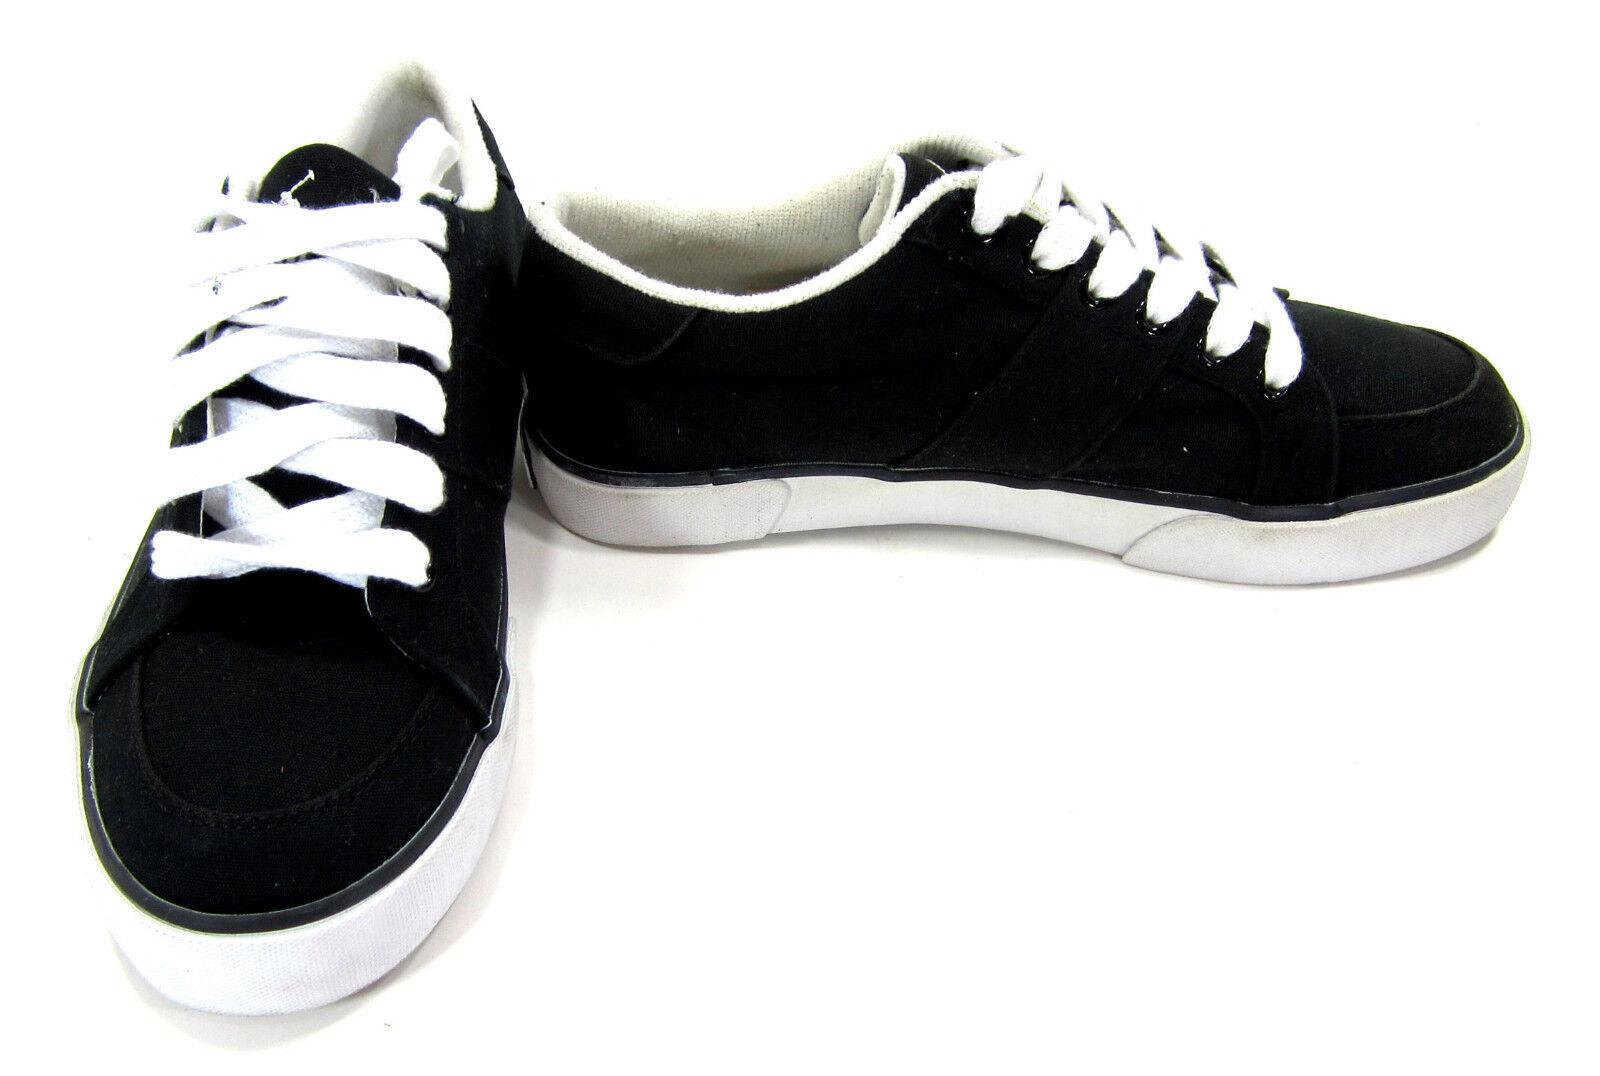 Polo Ralph Lauren shoes Harold Canvas Black White Sneakers Size 7